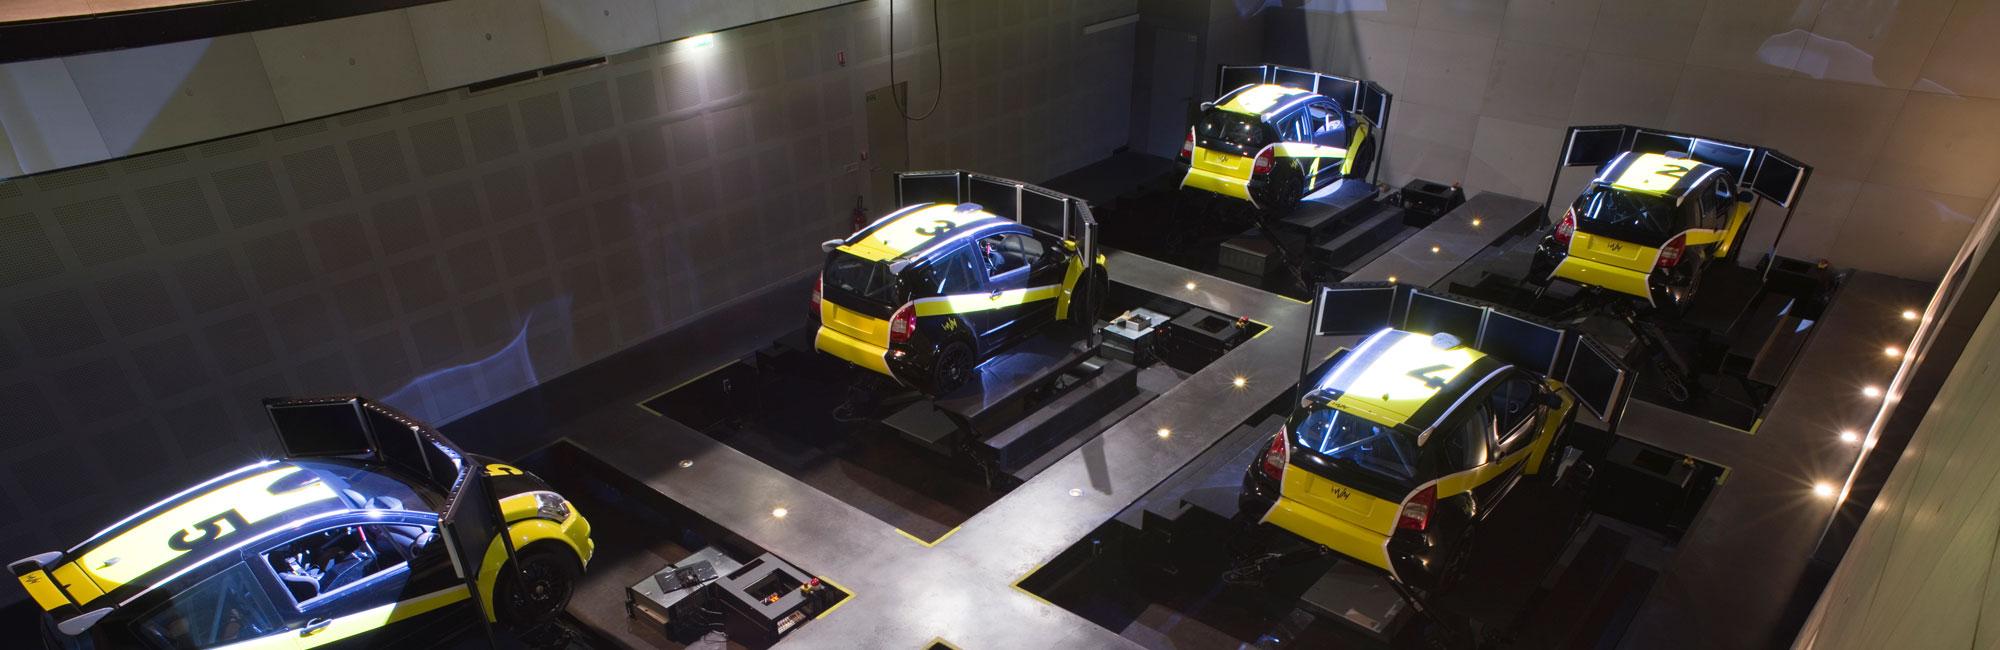 Simulation Course Automobile I-WAY Saint Quentin en Yvelines